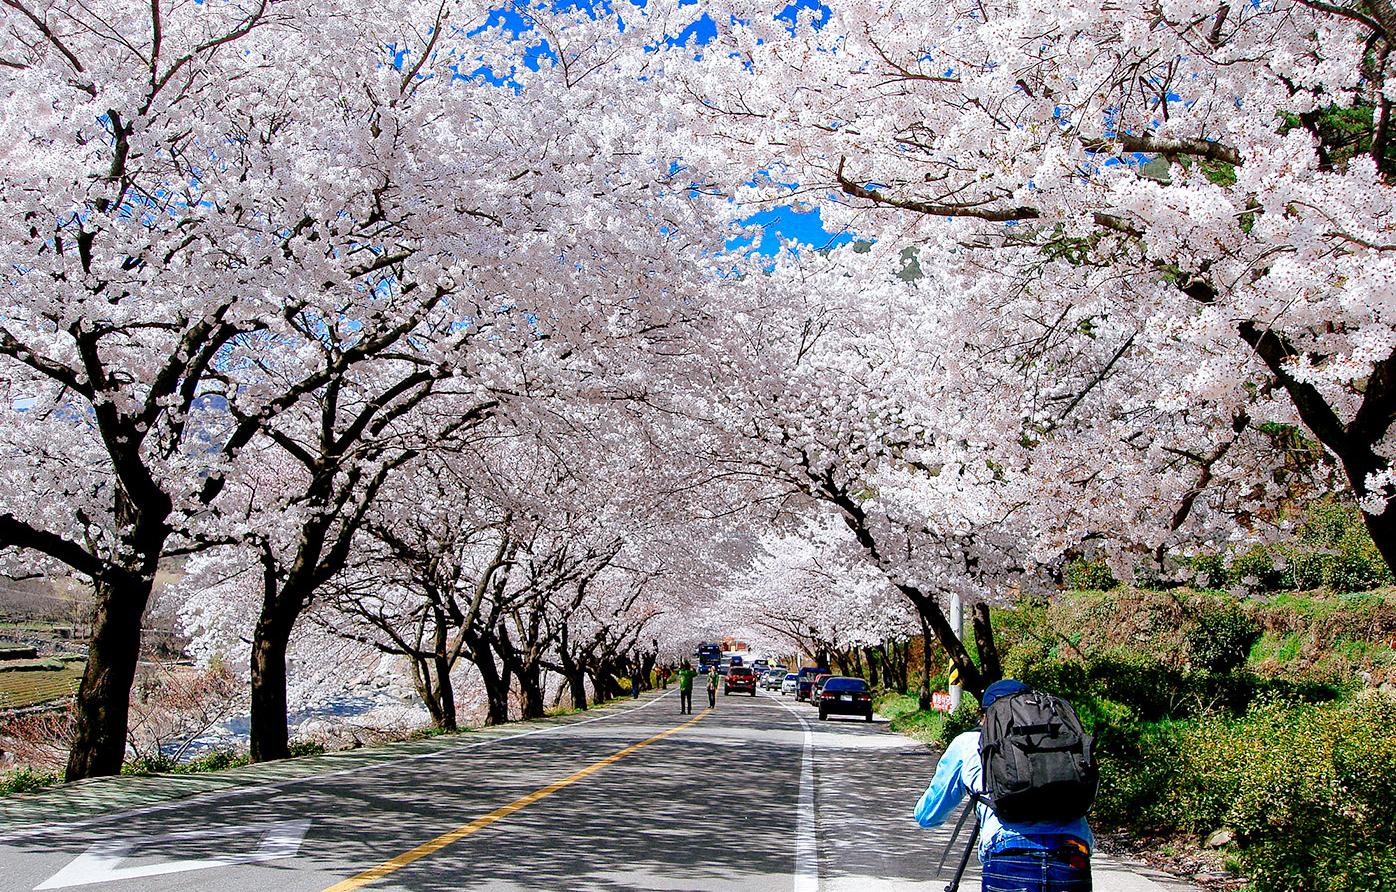 Late Fall Iphone Wallpaper Spring Weather In Korea 8 Shots Of Soju